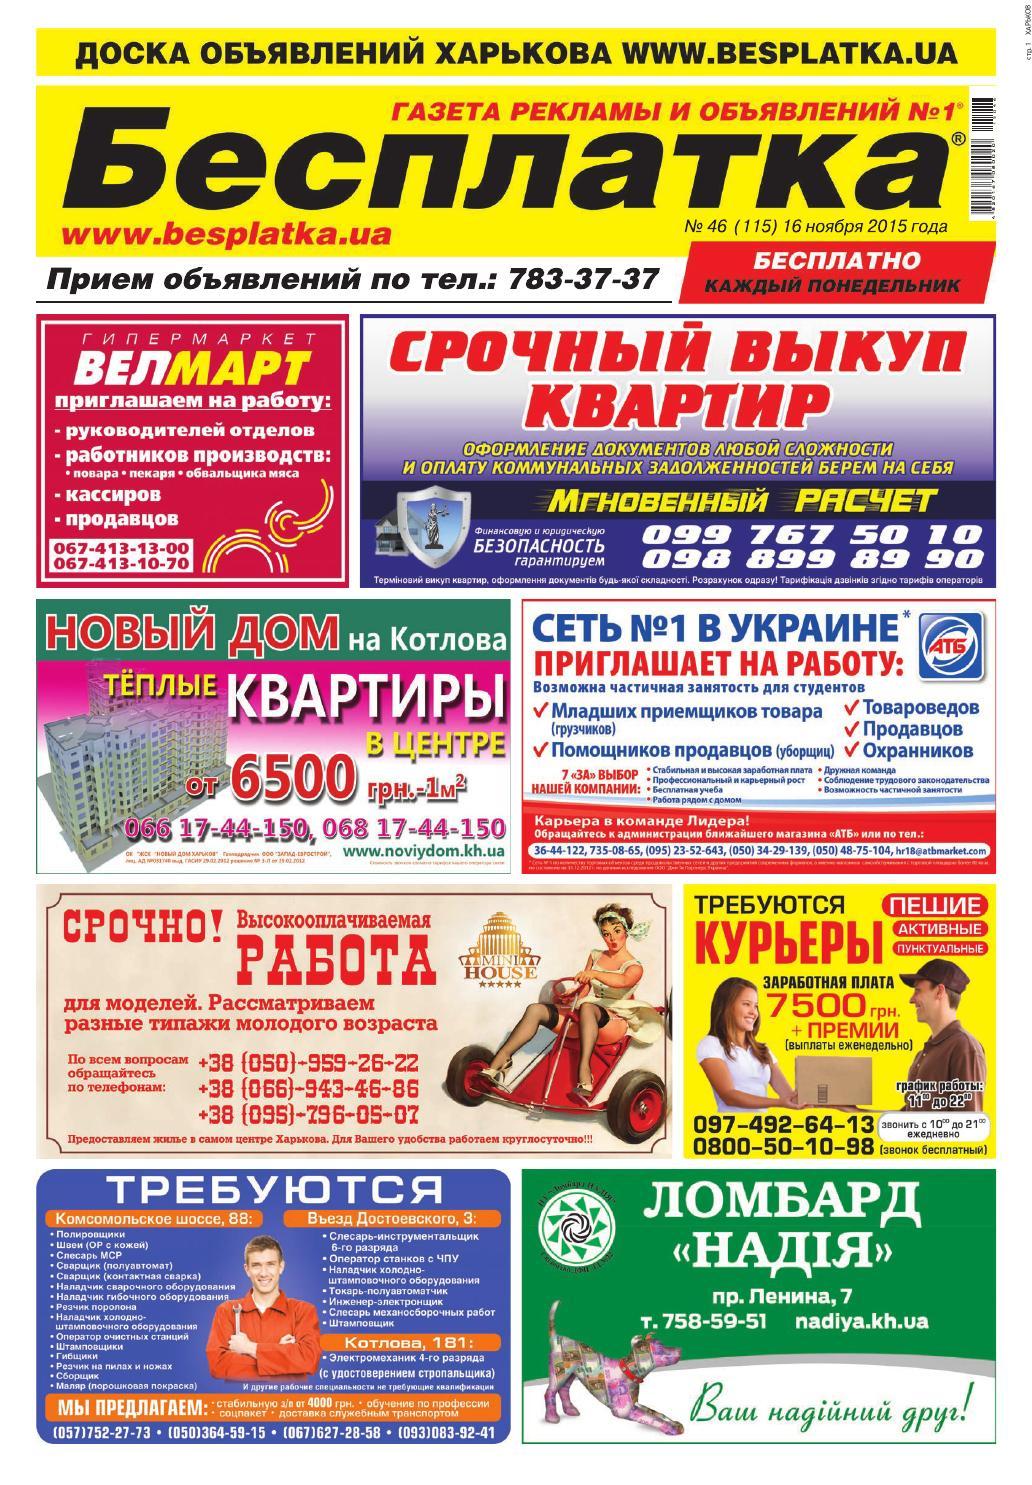 Besplatka  46 Харьков by besplatka ukraine - issuu 02dadb0389e